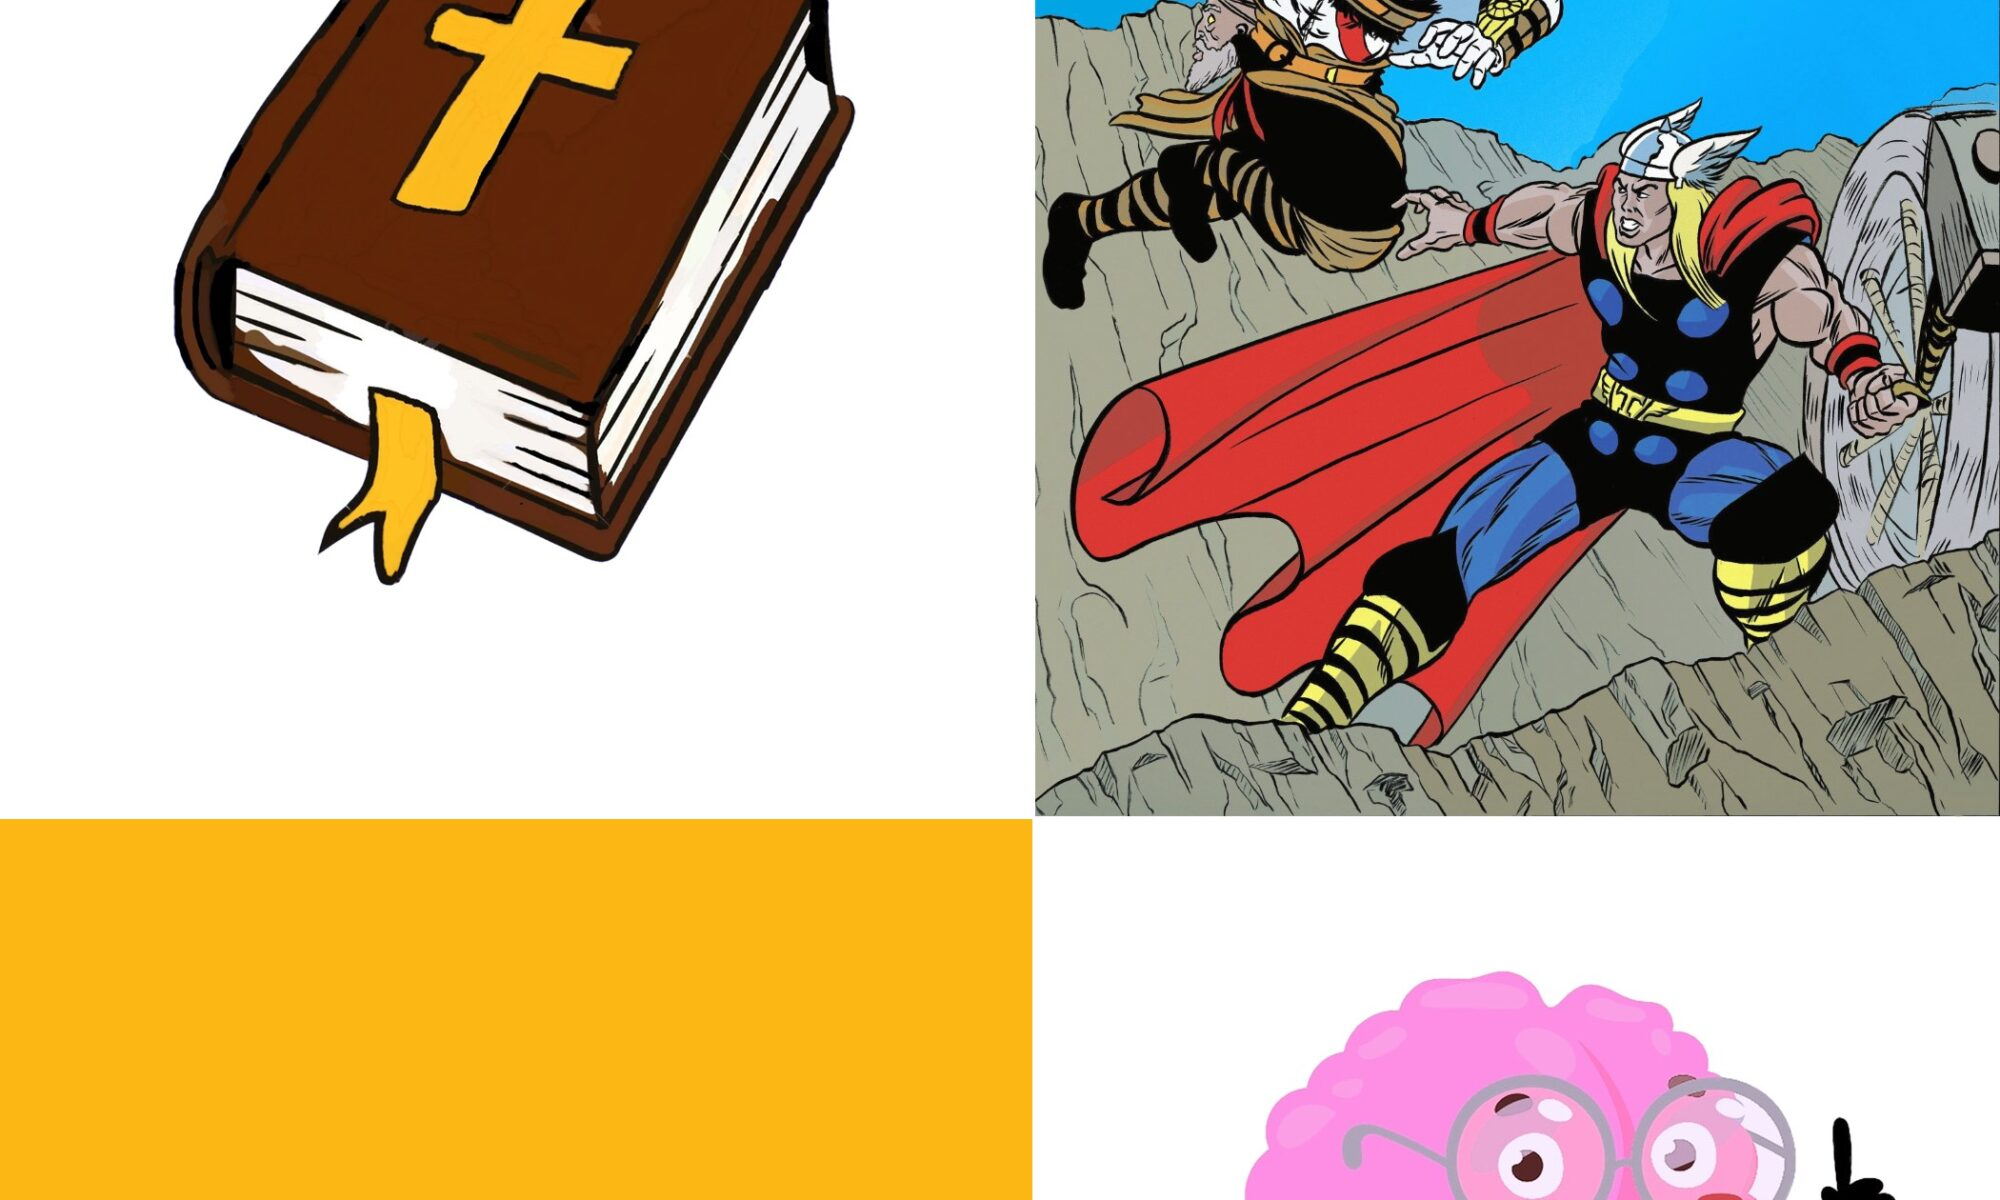 4 squares of cartoon-like drawings: bible in top left corner, fighting superheroes in top right corner, pottery on rocks in bottom left corner, brain wearing glasses in bottom right corner